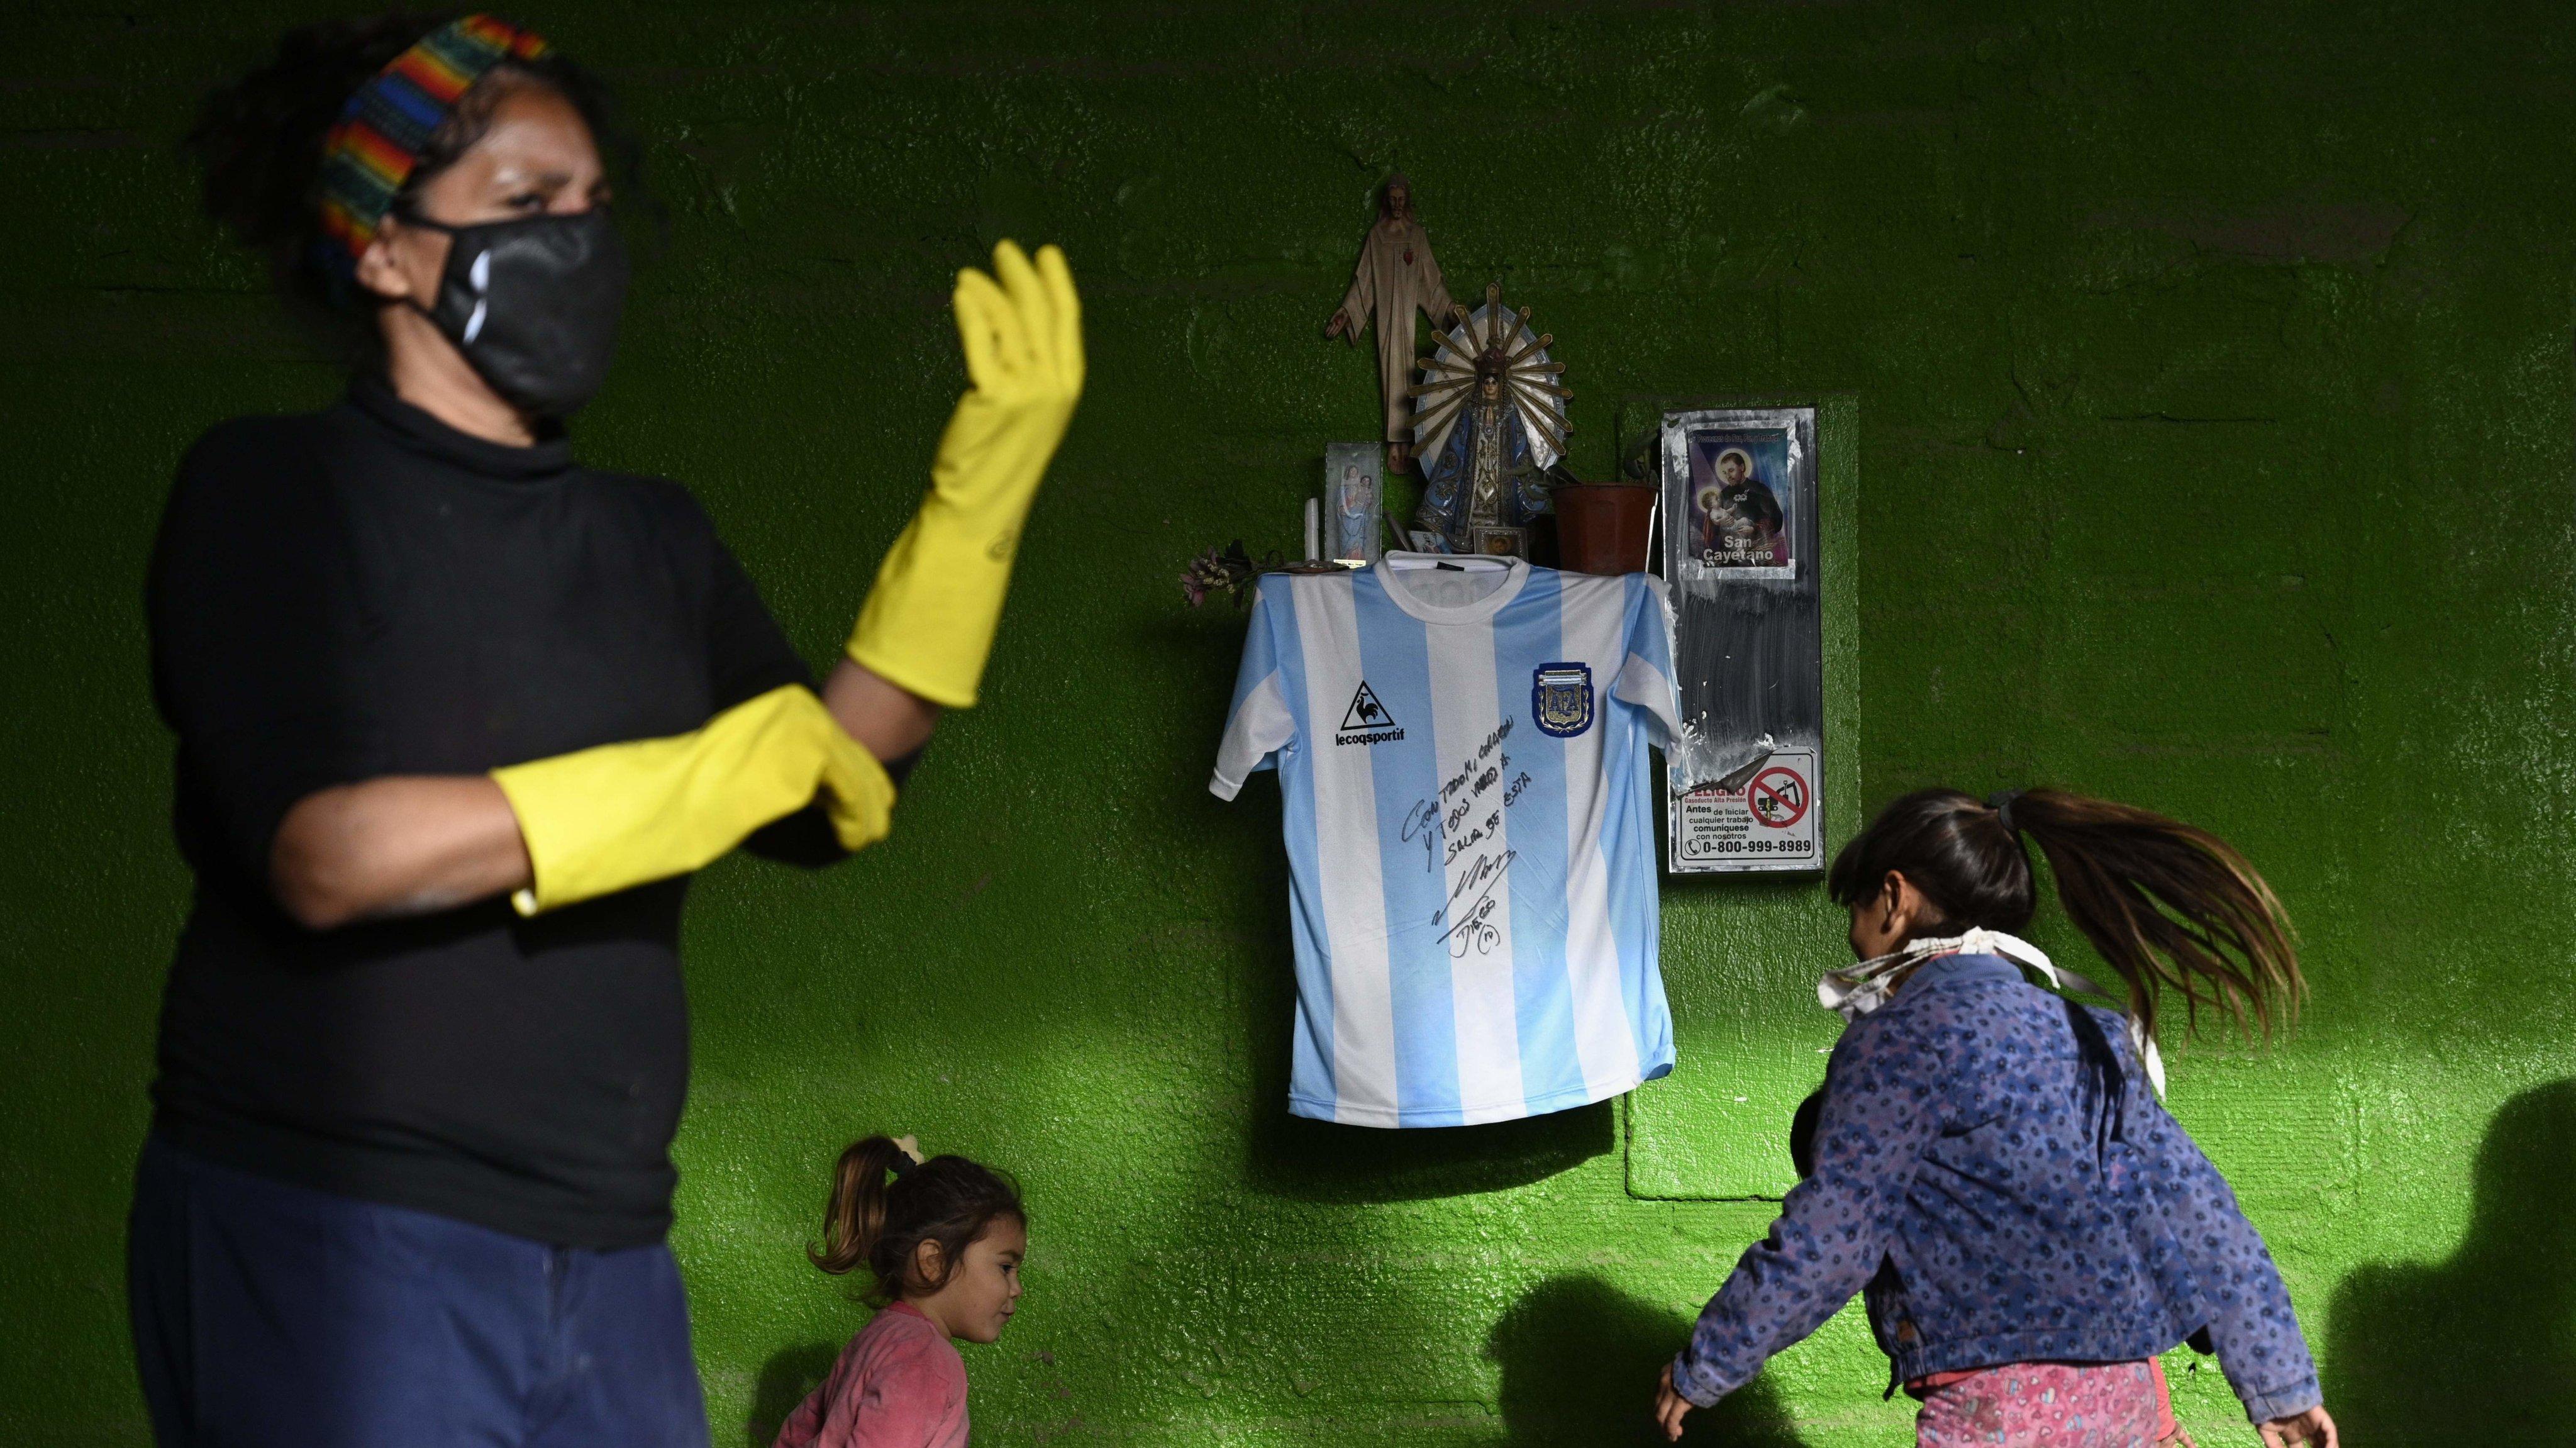 TOPSHOT-ARGENTINA-HEALTH-VIRUS-FBL-MARADONA